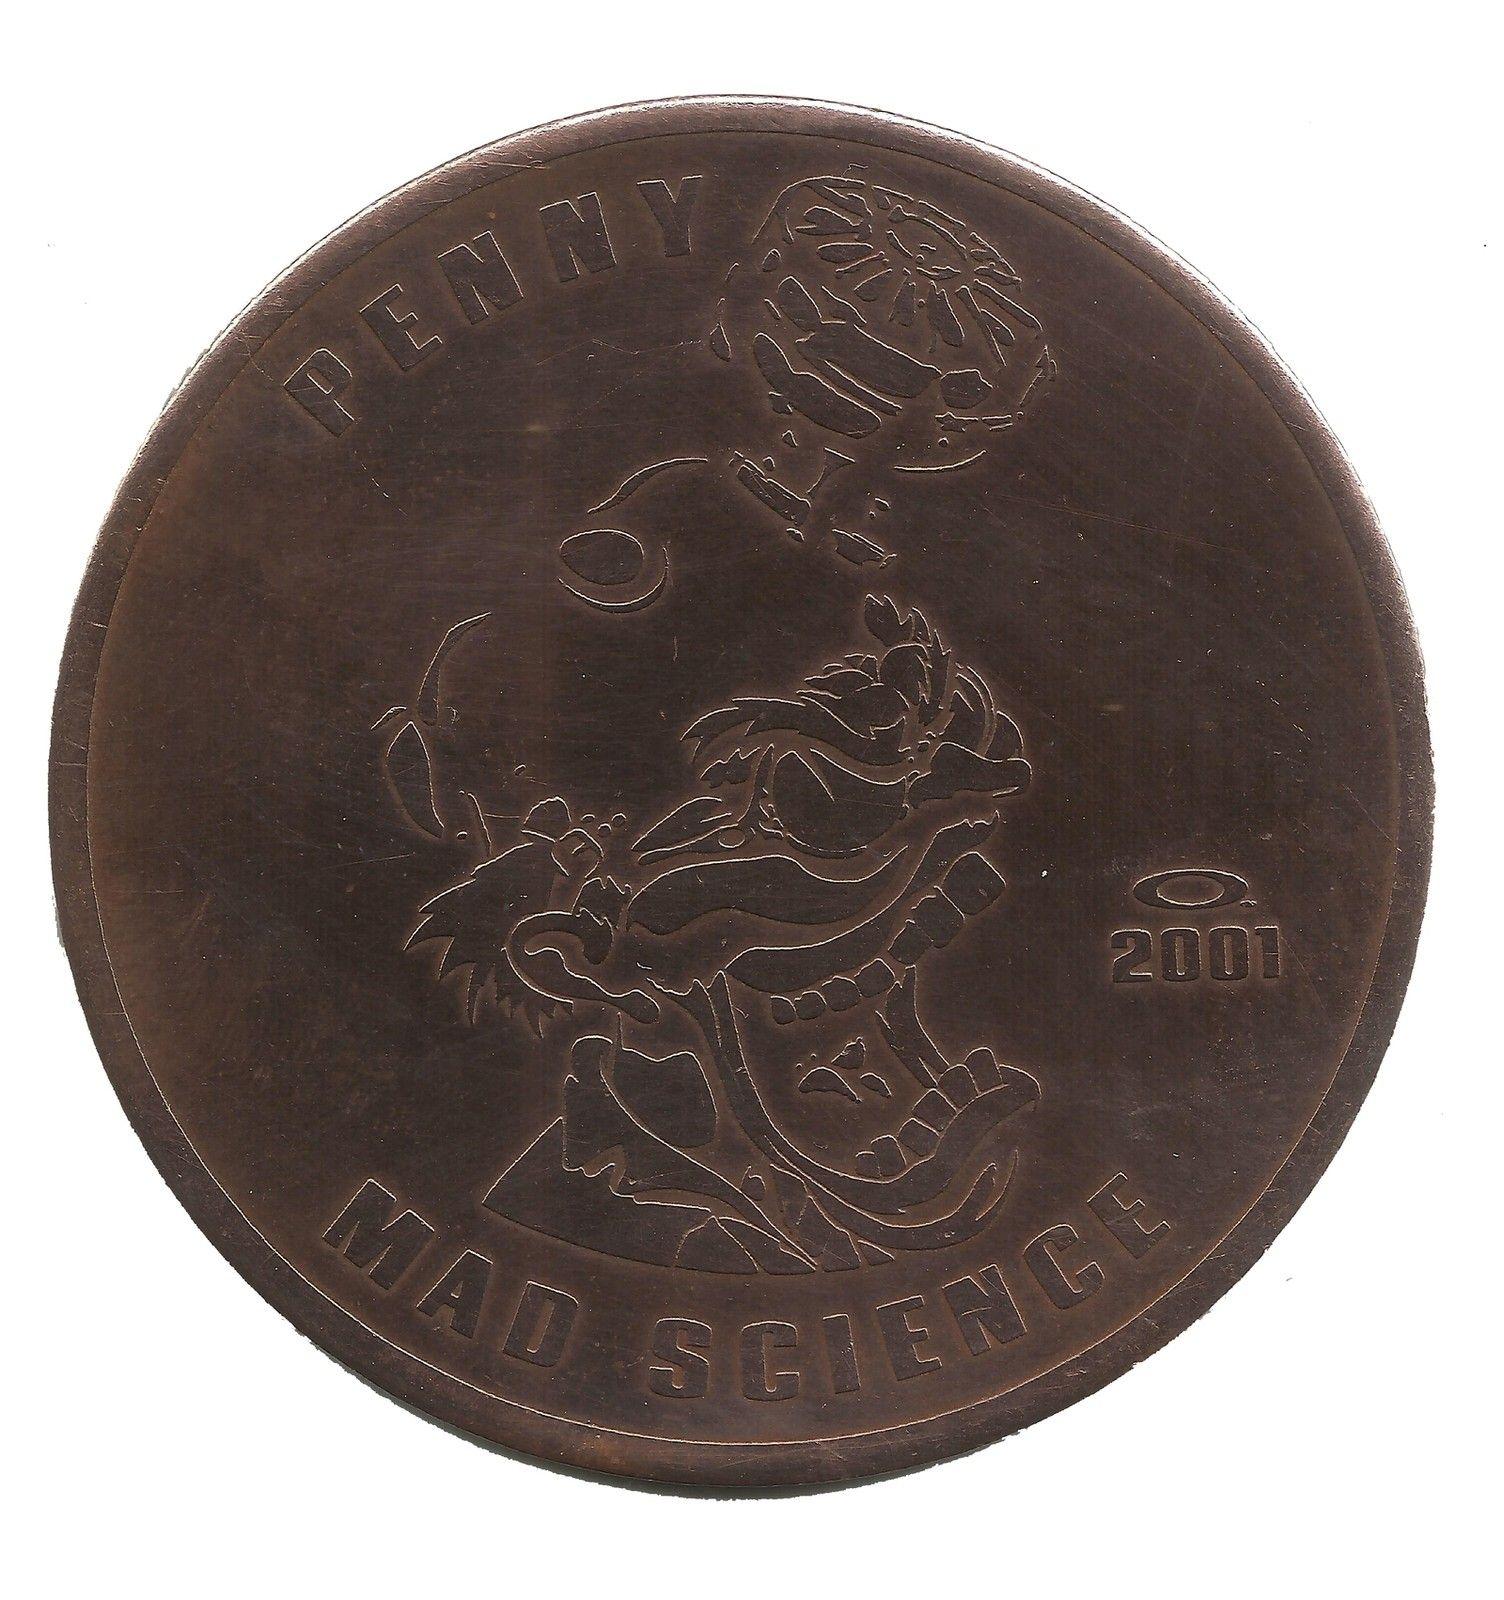 Oakley Penny Copper Coin Specimen - MAD SCIENCE ERA 2001 - Mad Science.jpg